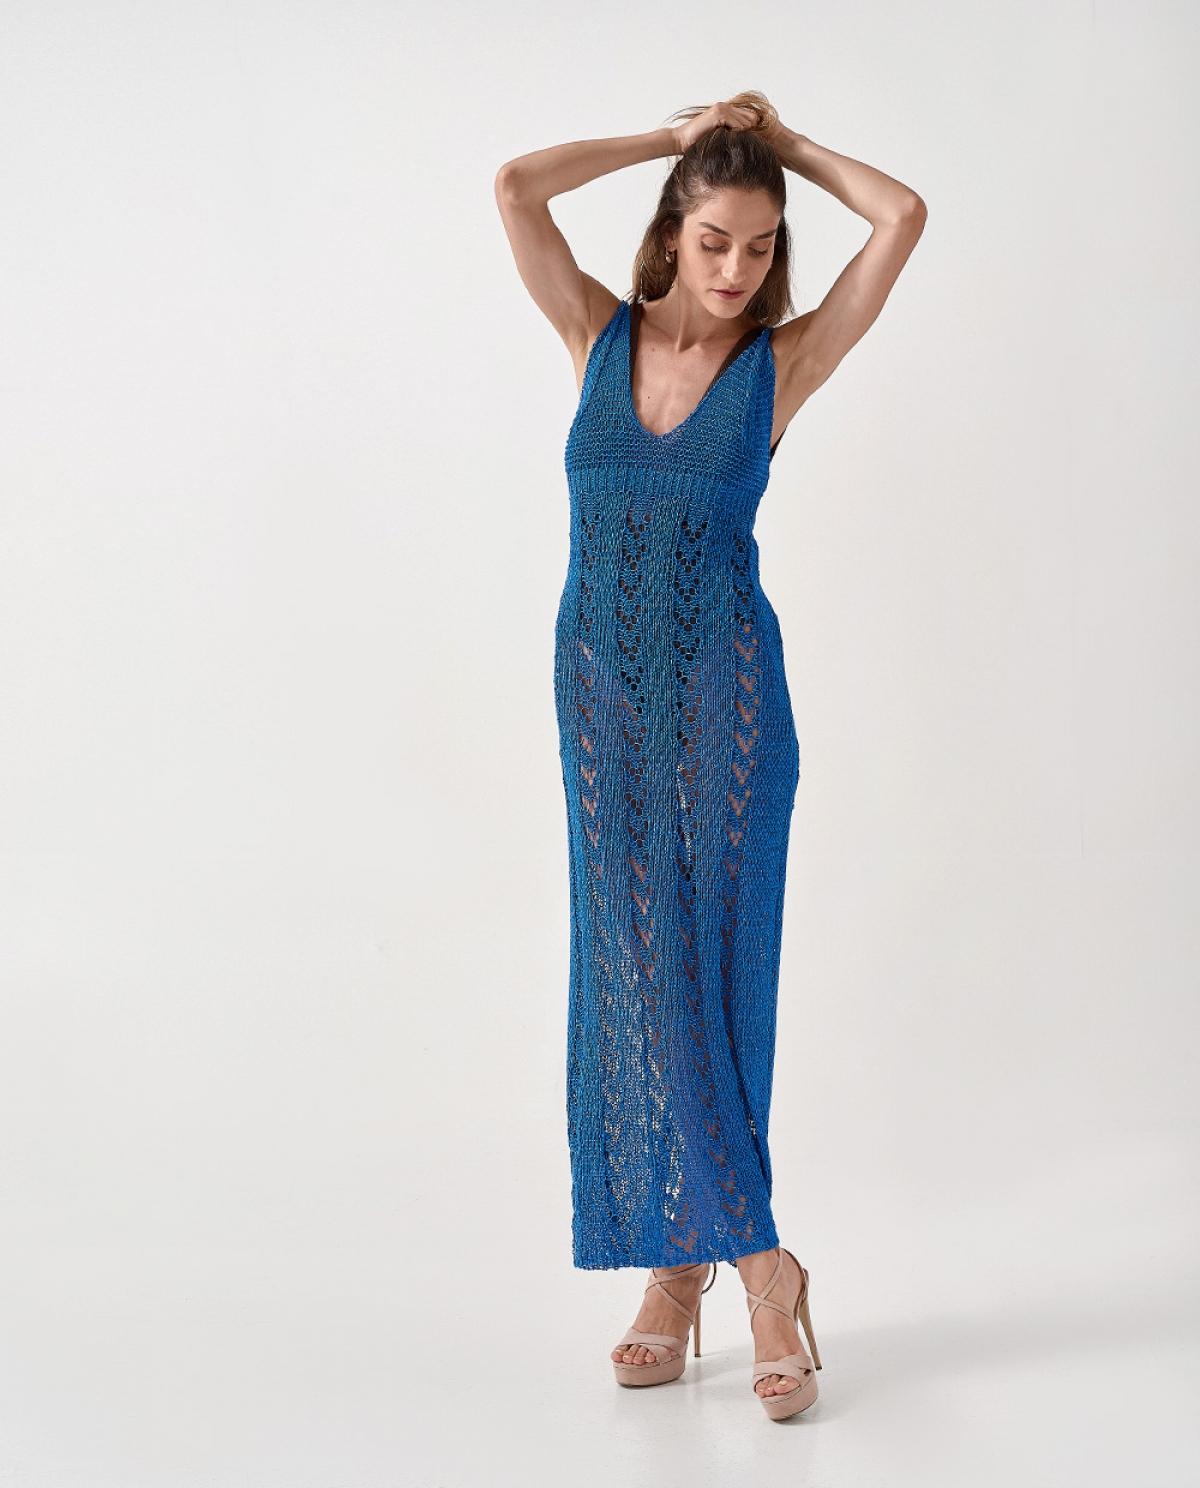 Blue Maxi No Sleeves Dress